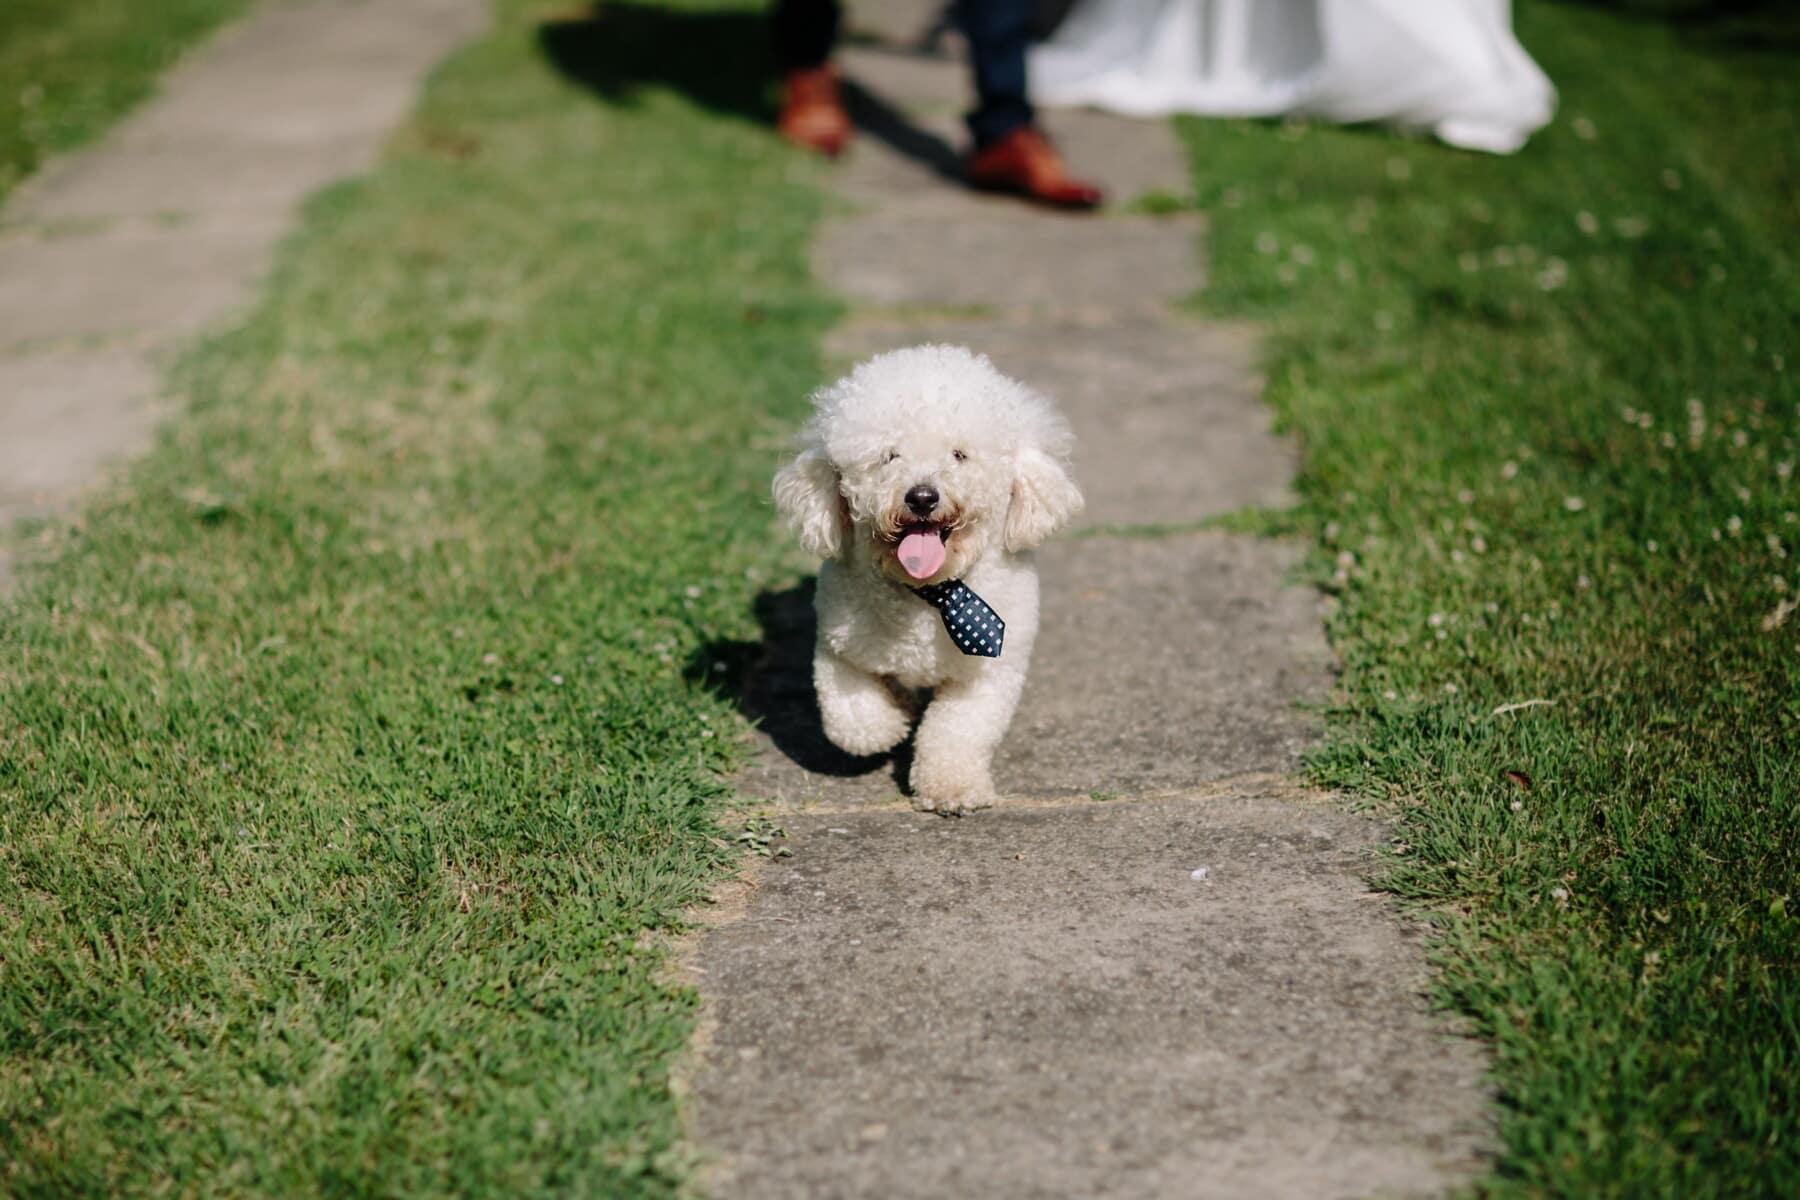 cérémonie, mariage, chien, attacher, adorable, drôle, animal, mignon, animal de compagnie, herbe